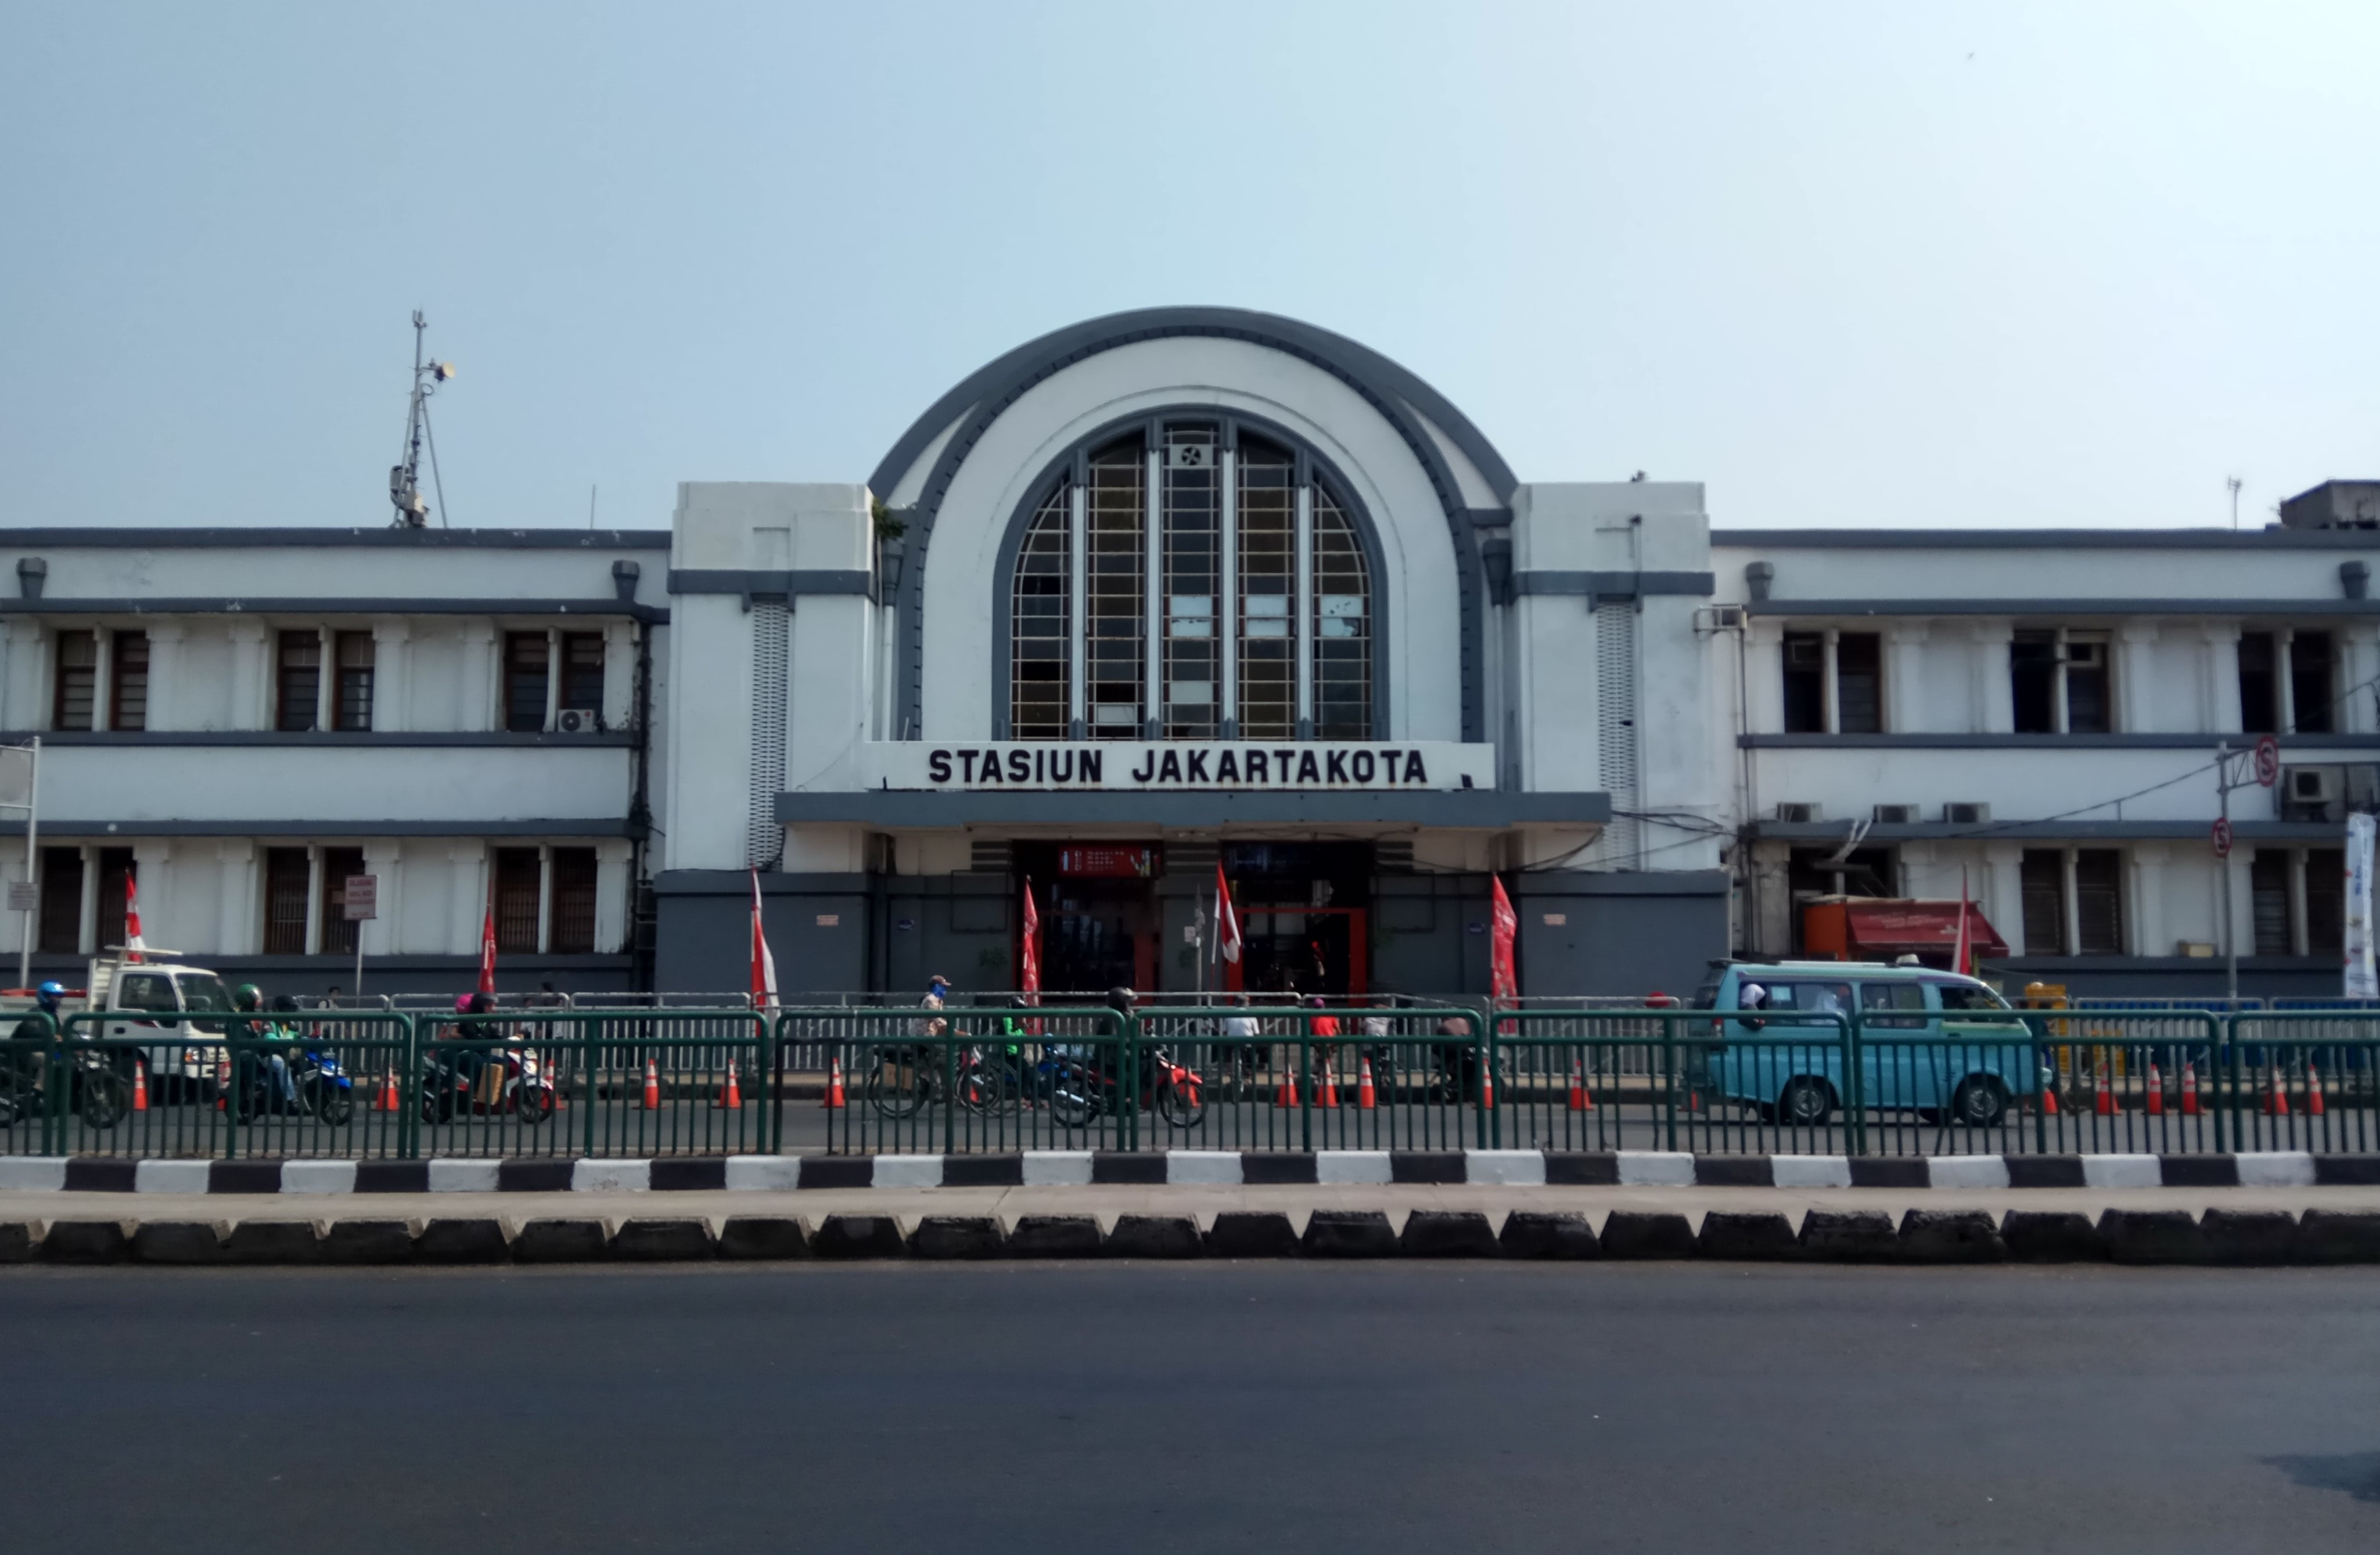 Stasiun Jakarta Kota Bahasa Indonesia